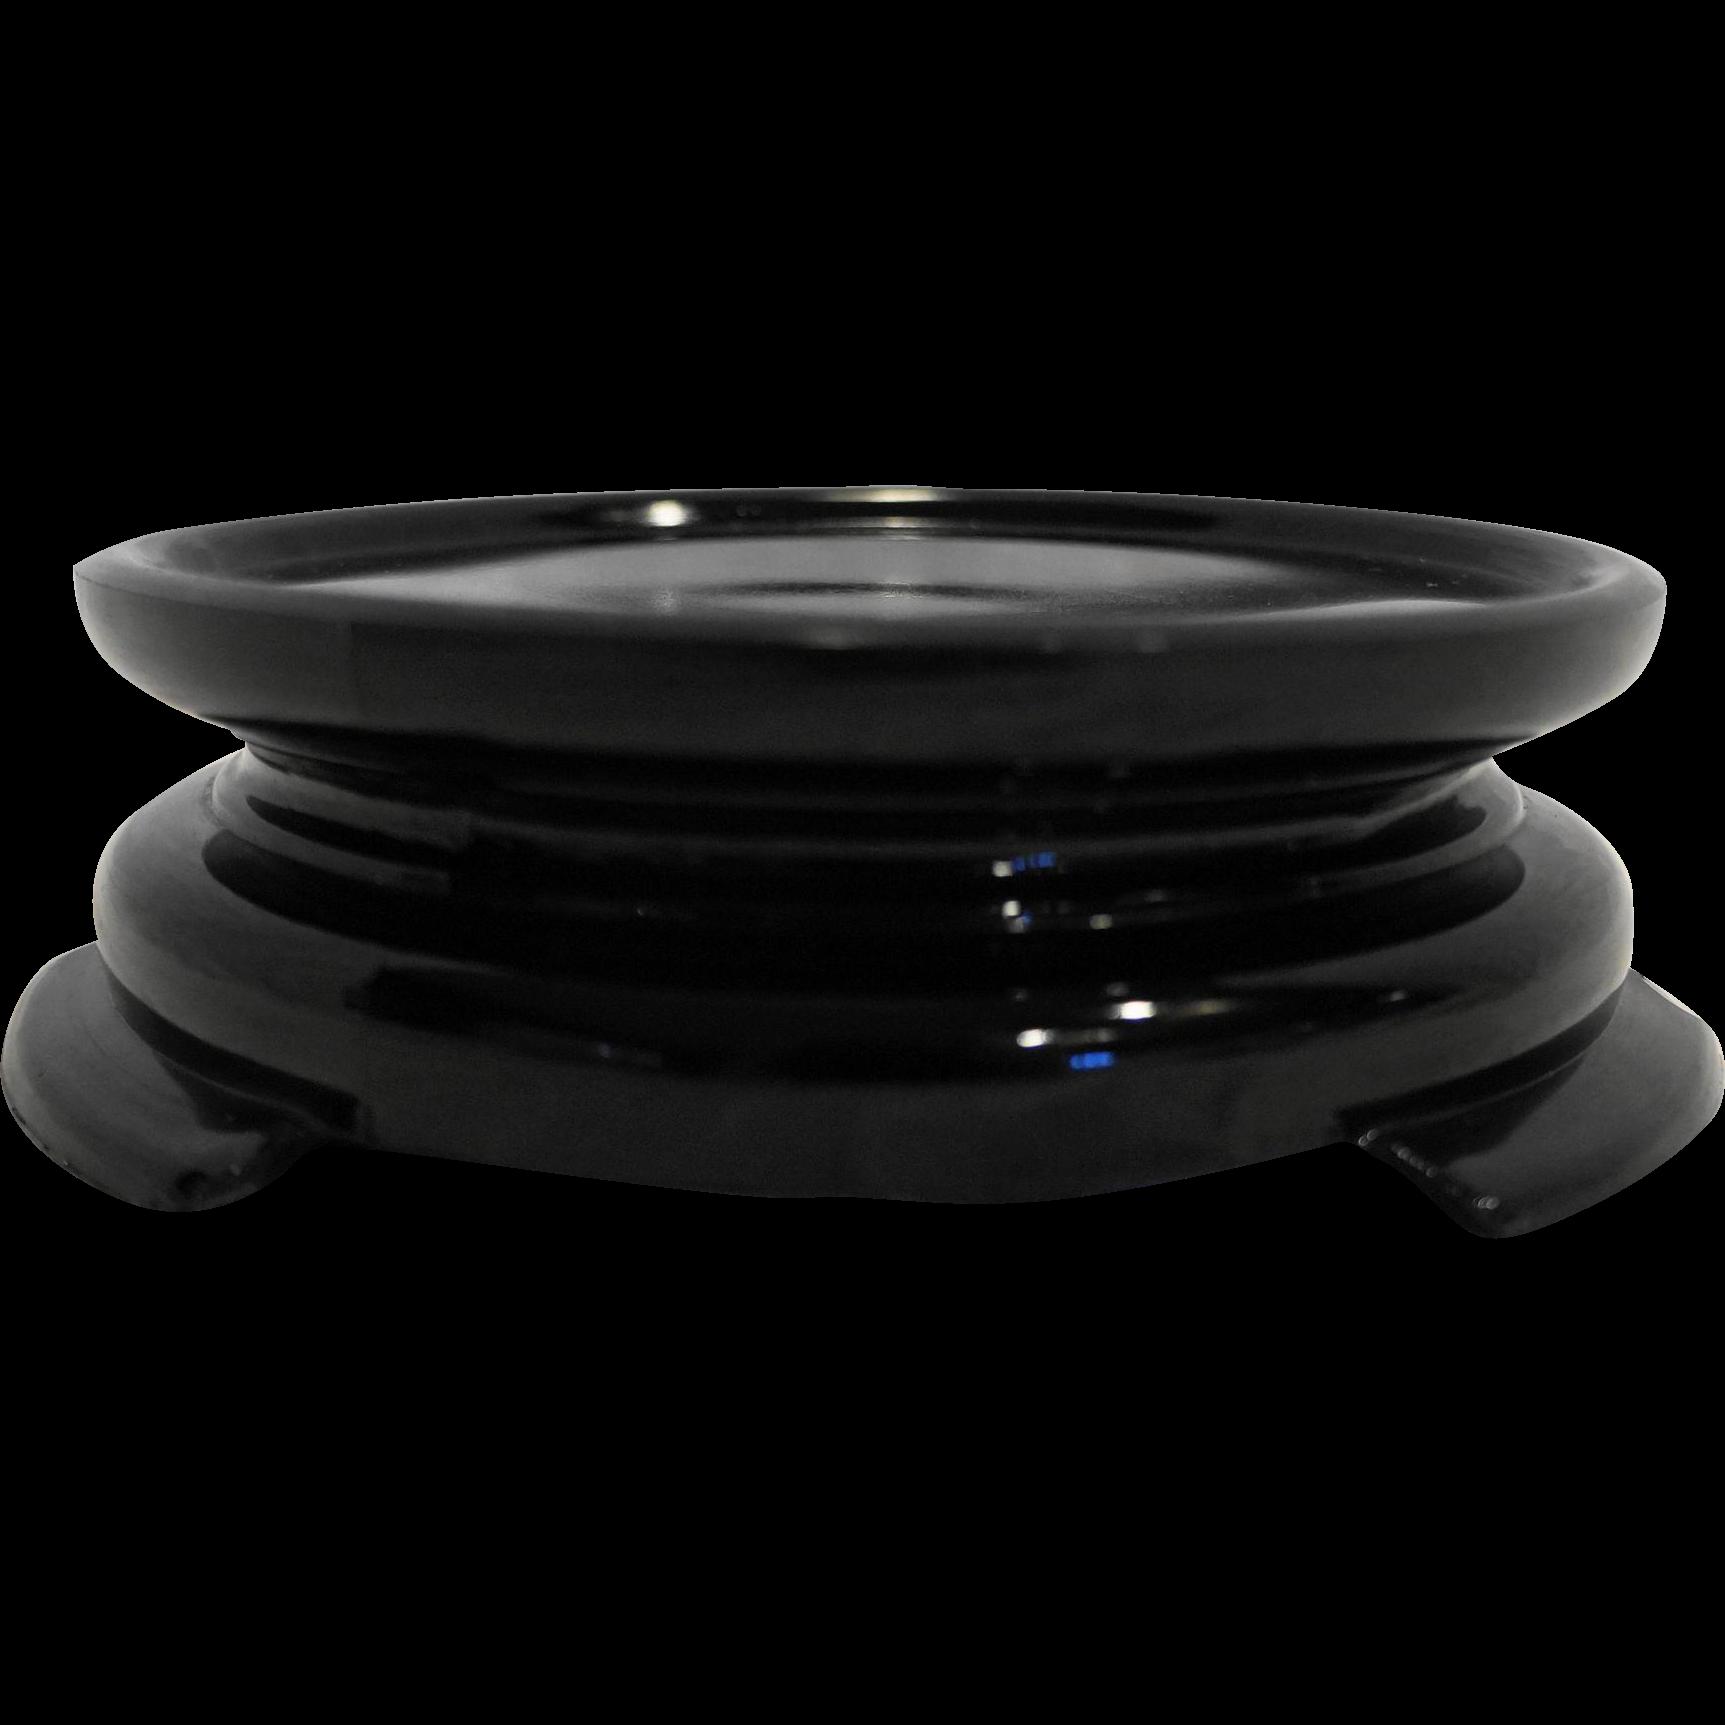 Black Amethyst Depression Glass Pedestal Display Stand 5 IN